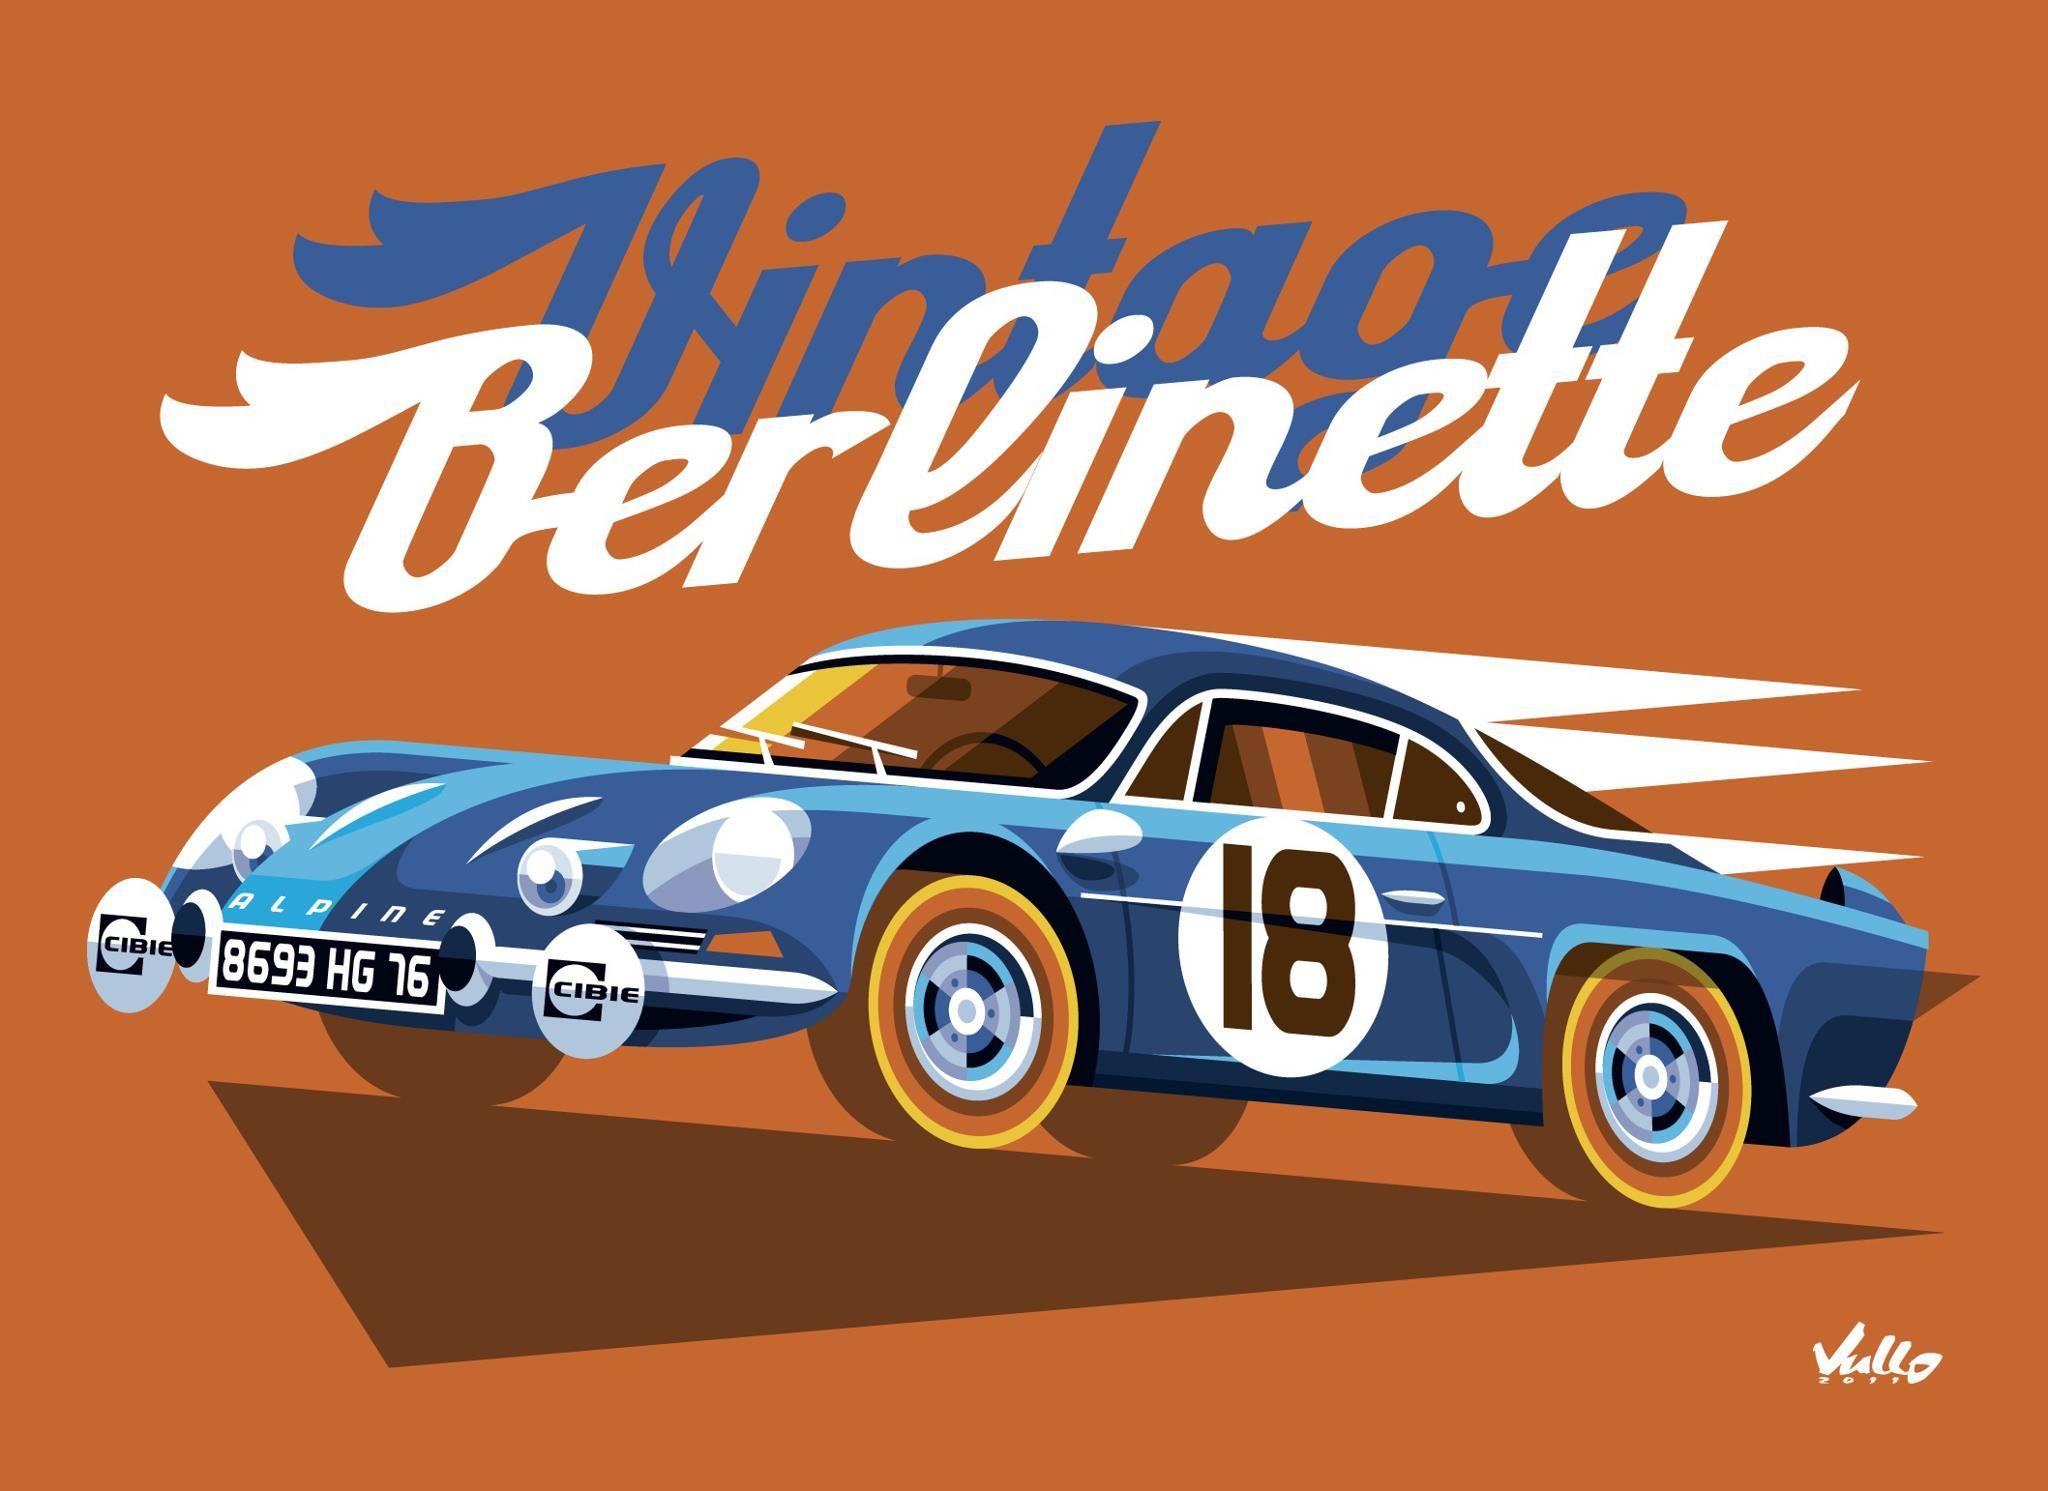 Vintage Berlinette, Alpine Berlinette by Mat Vullo. http://www.mateovullo.com/